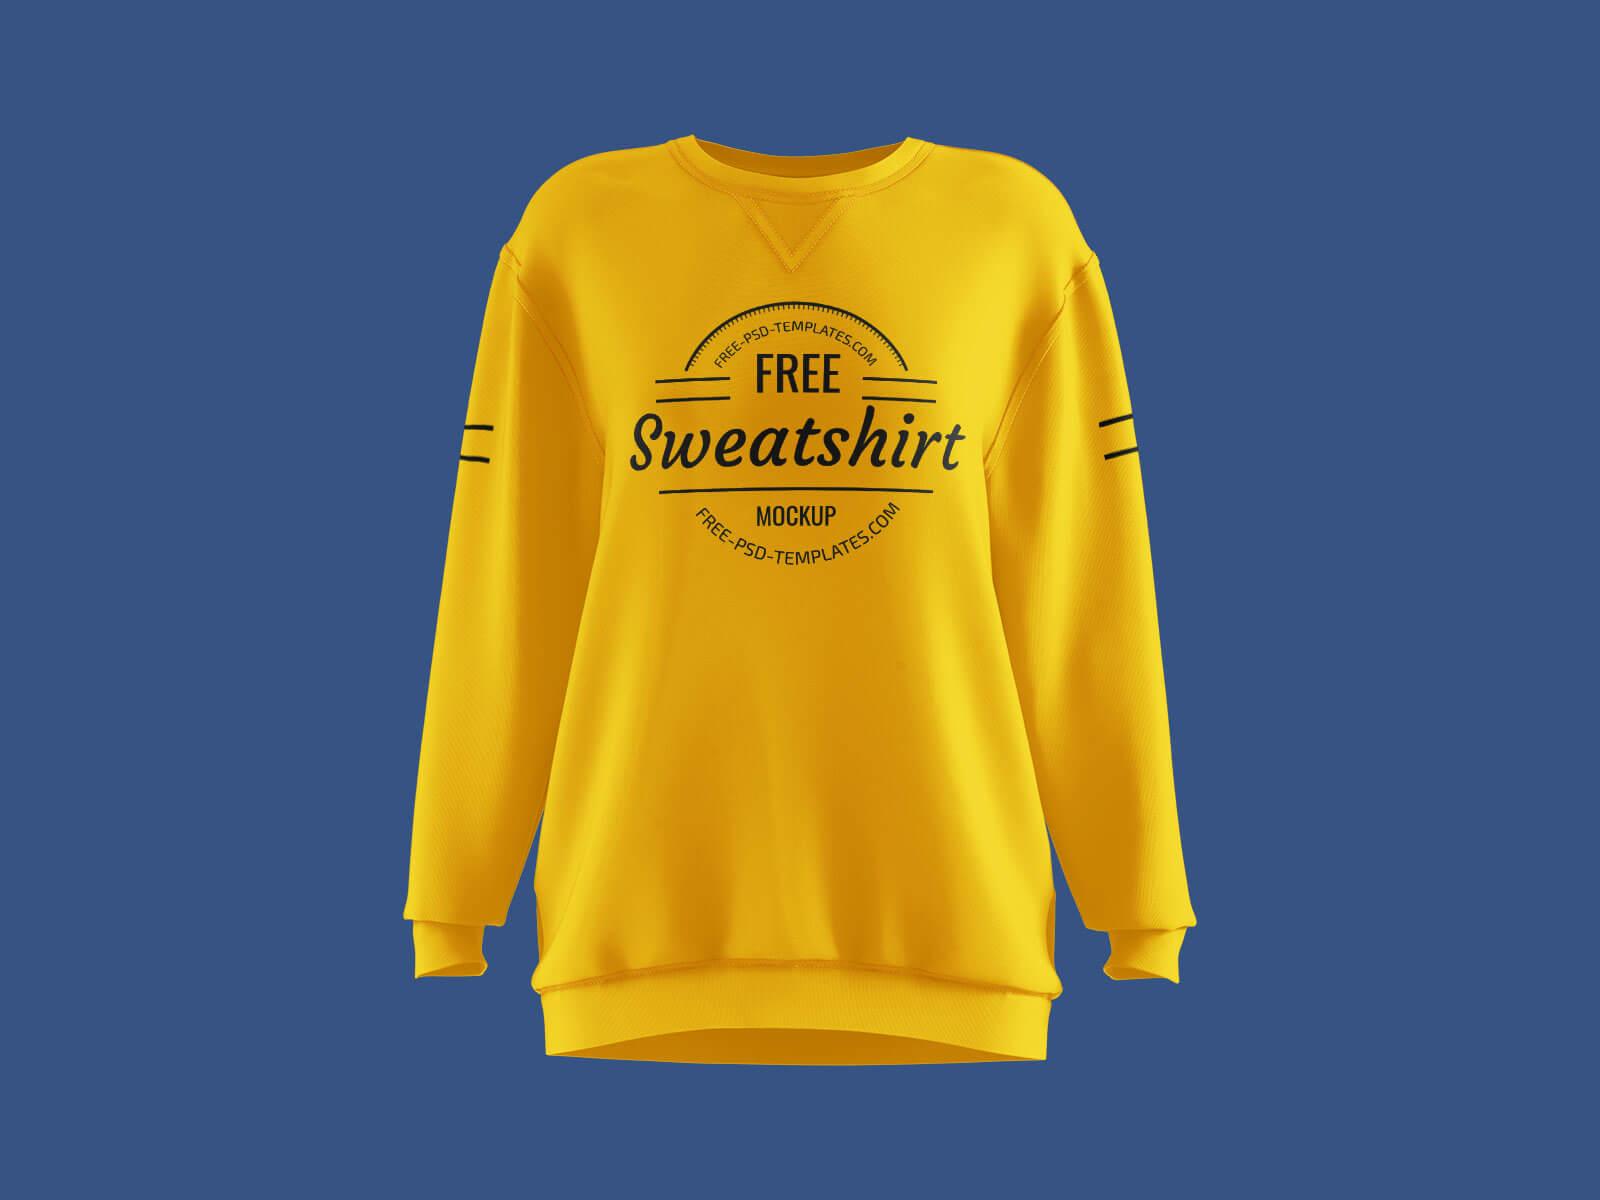 Free Long Sleeves Women's Sweatshirt Mockup PSD Set (1)